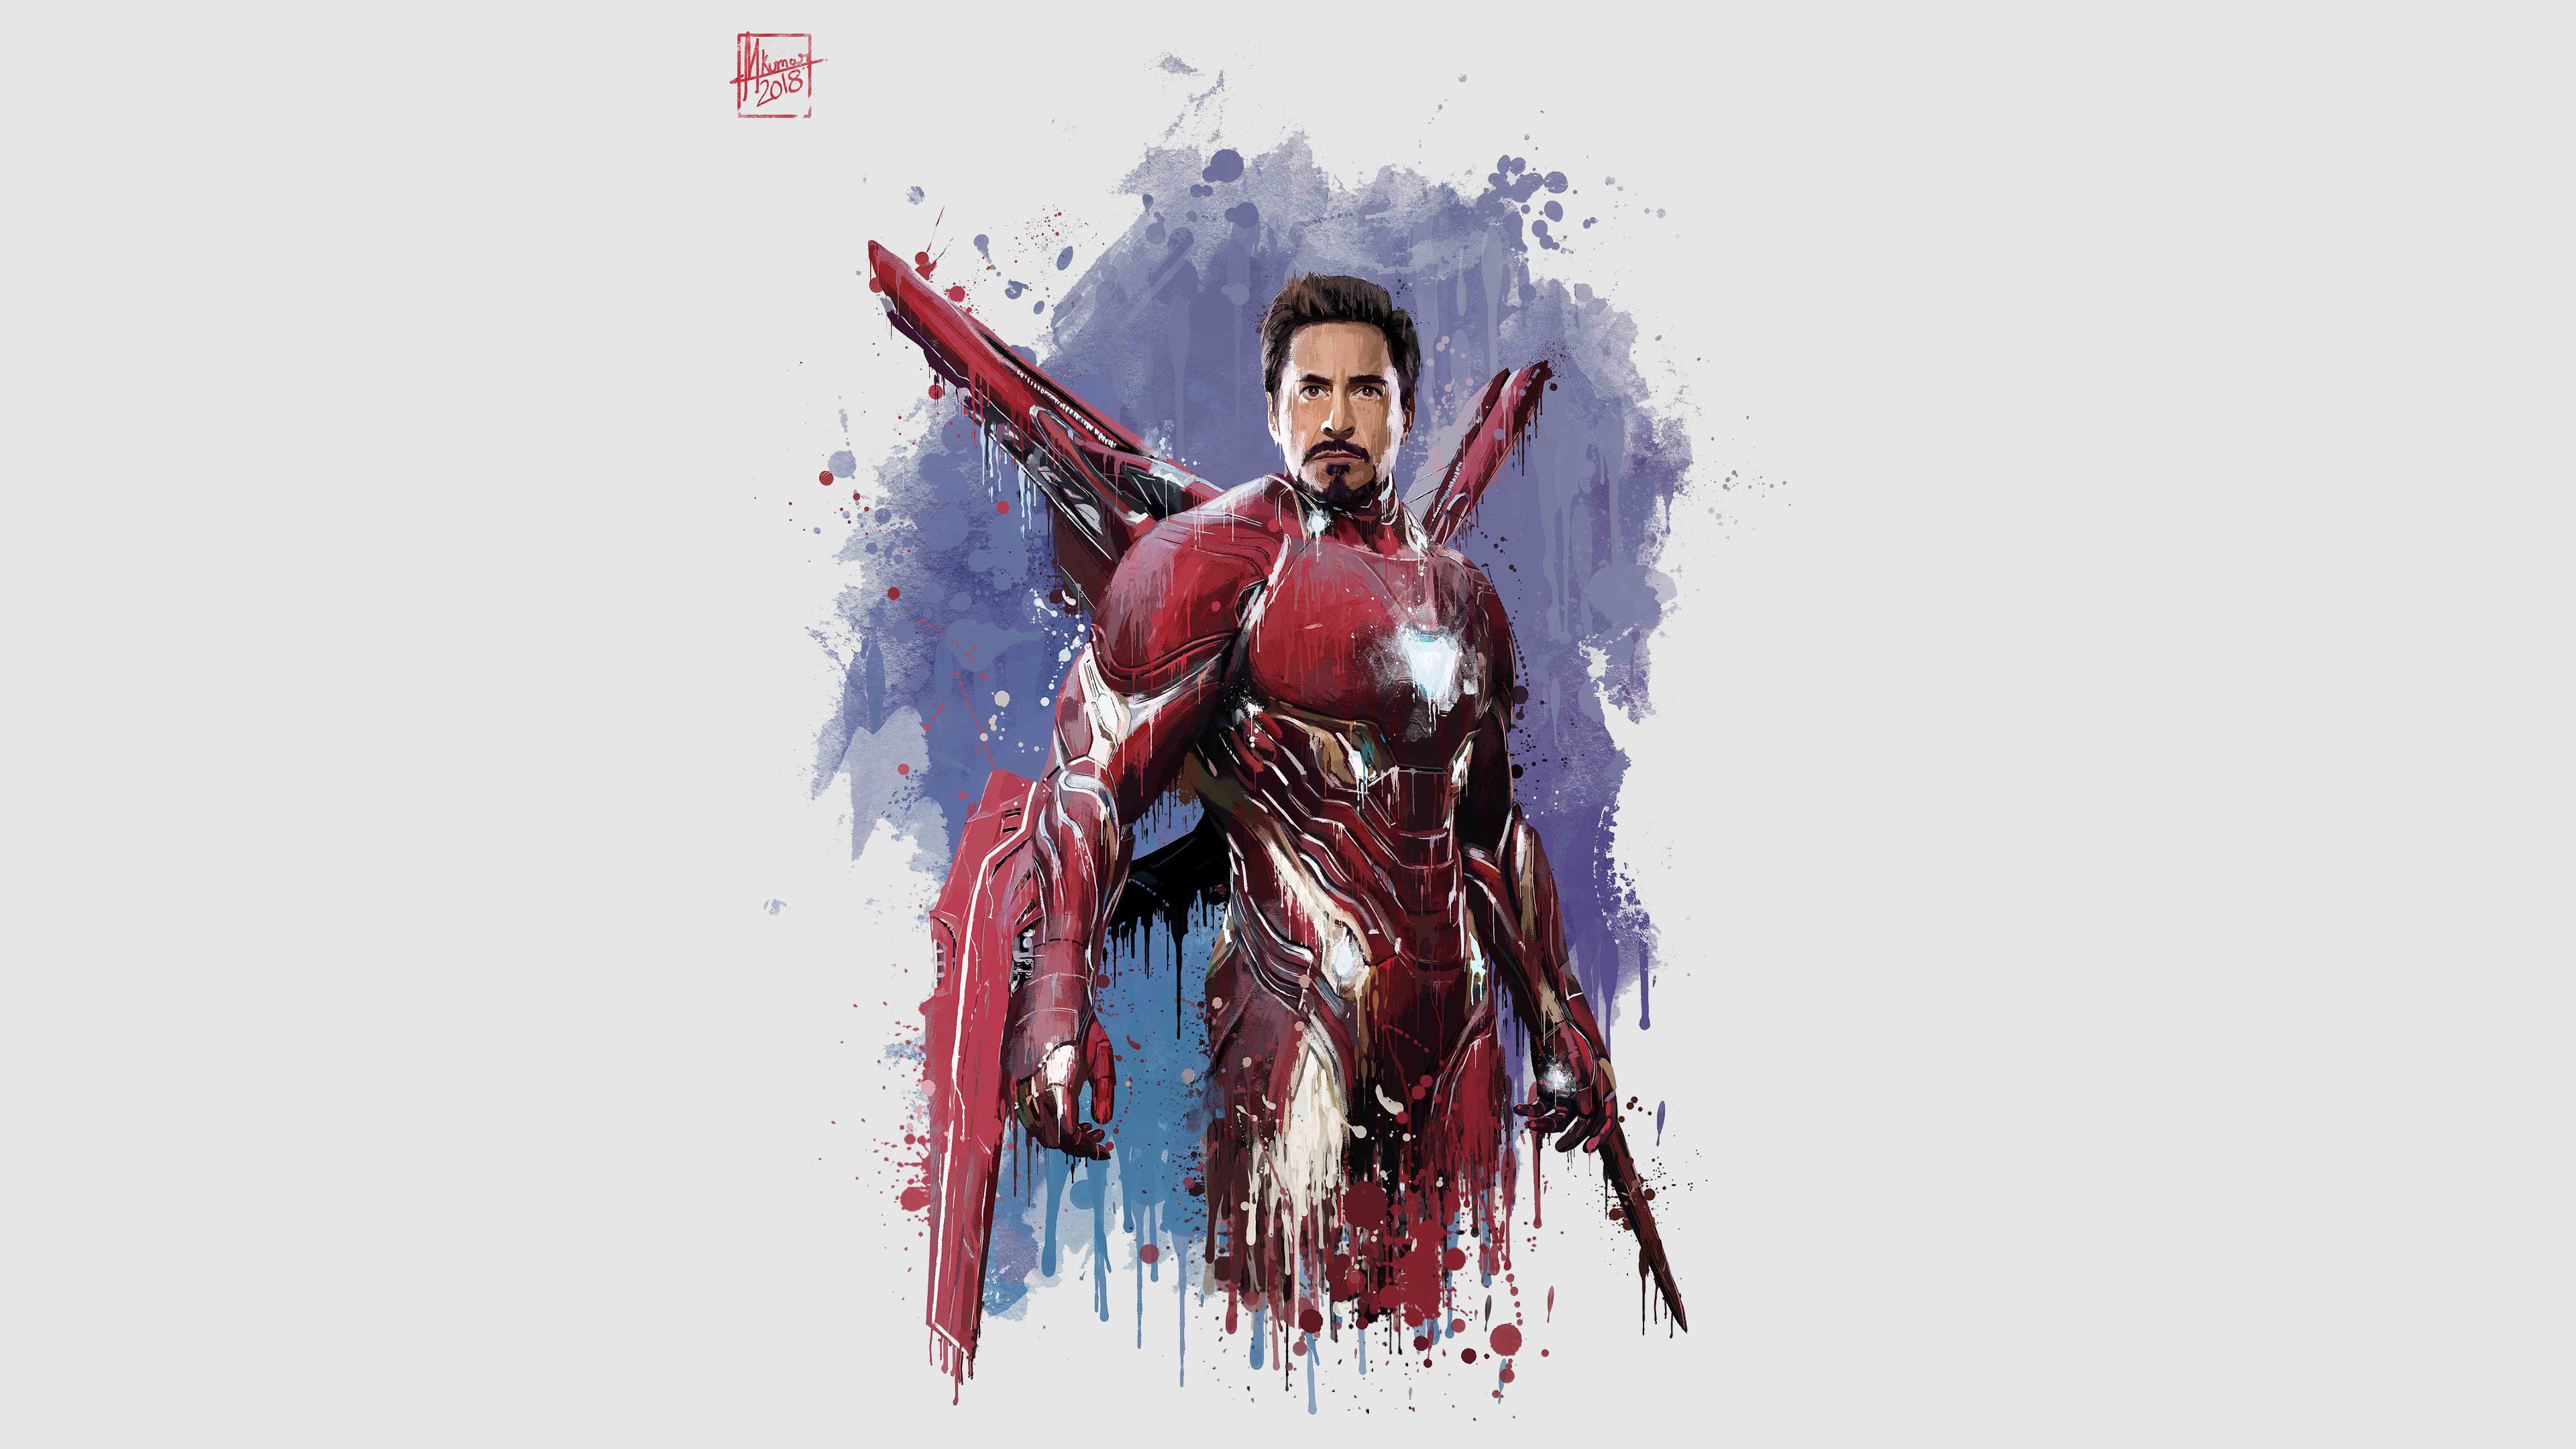 Download 3840x2400 Wallpaper Iron Man New Suit Avengers Infinity